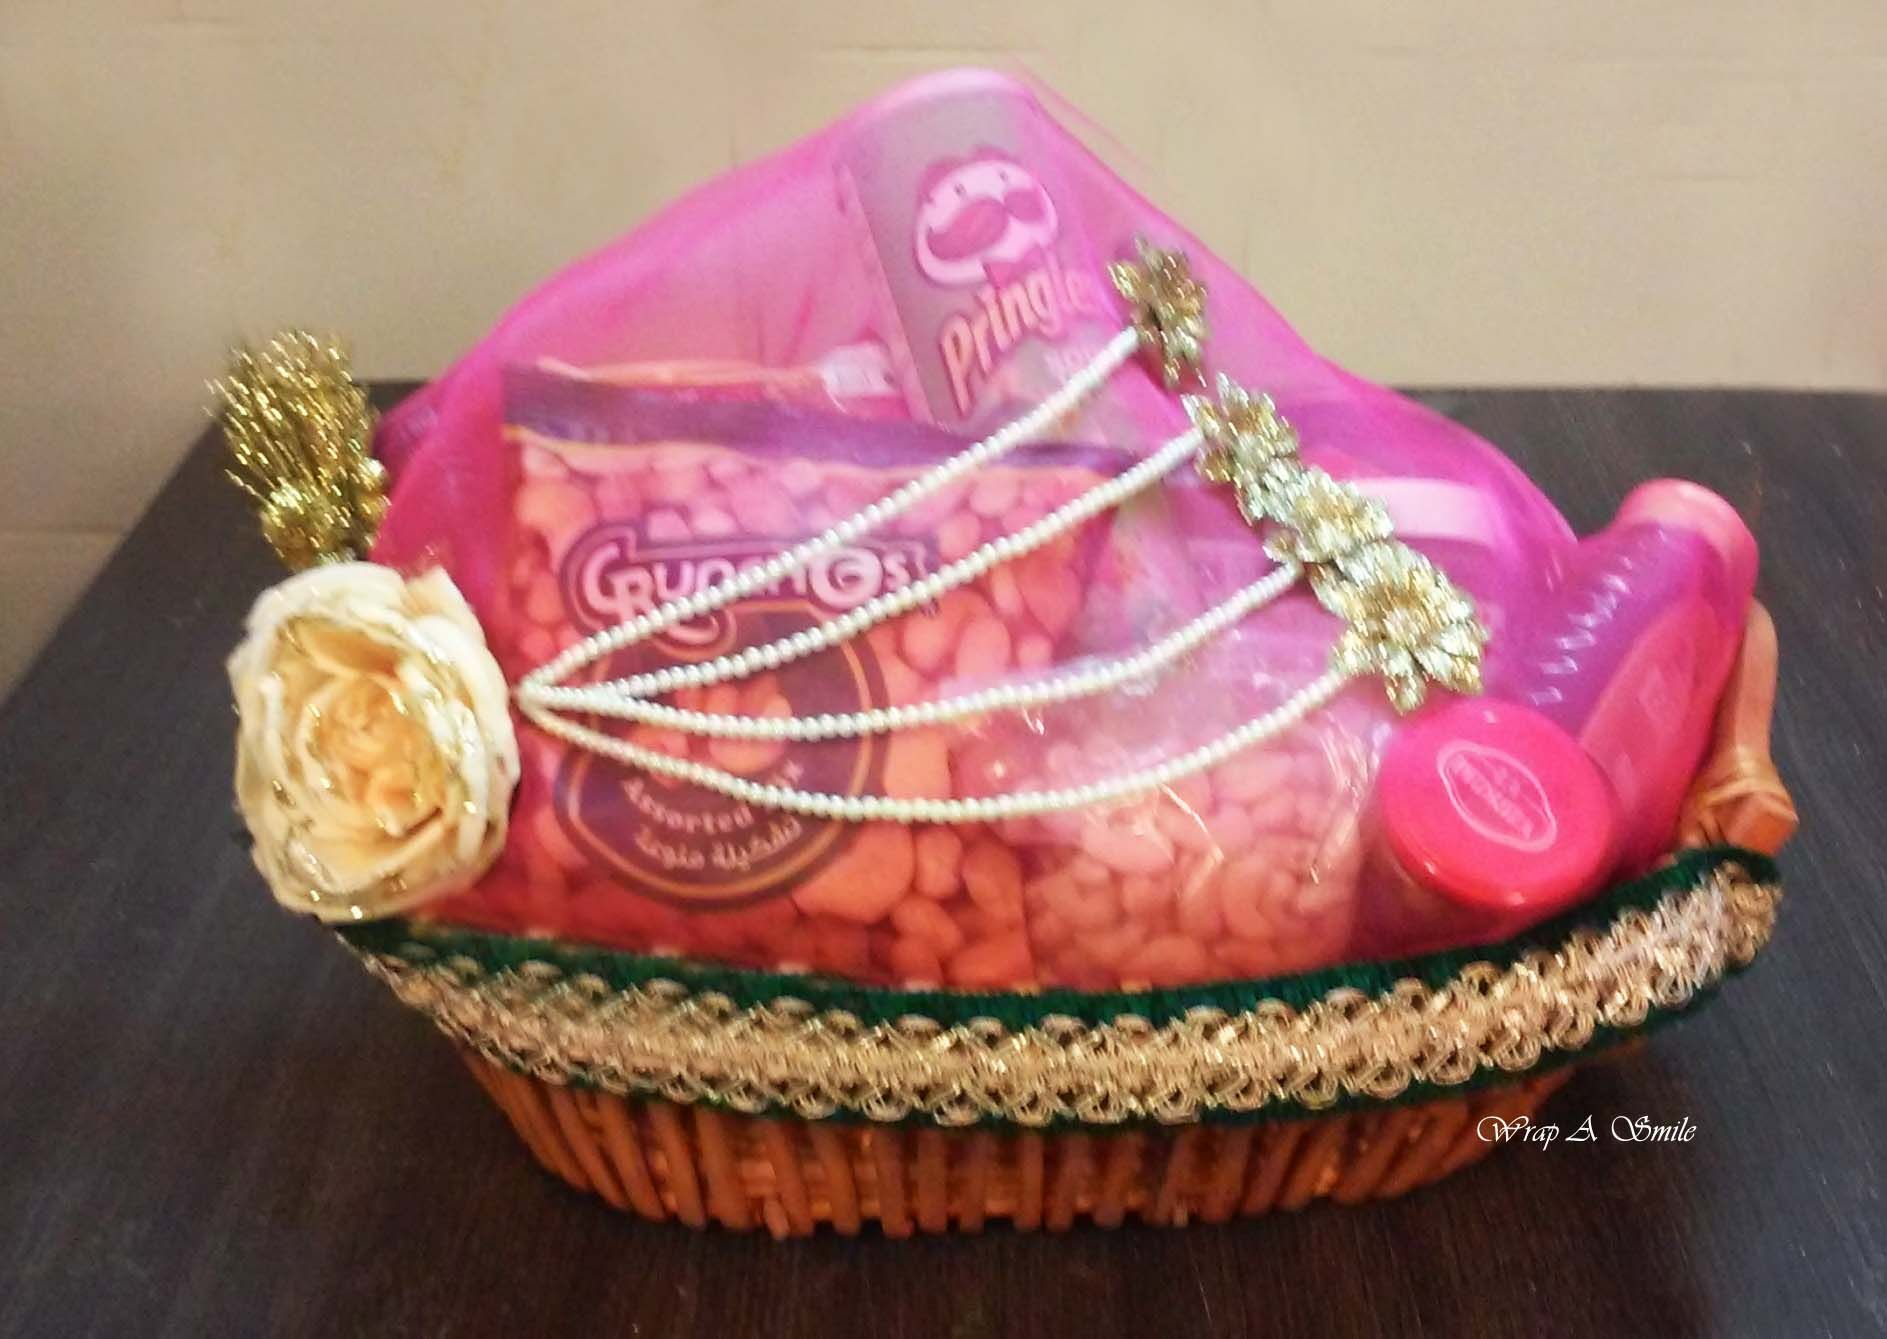 Wedding Gift Hampers India : Shagun Wedding Hamper Baskets designed At Wrap A Smile - By Shreya ...